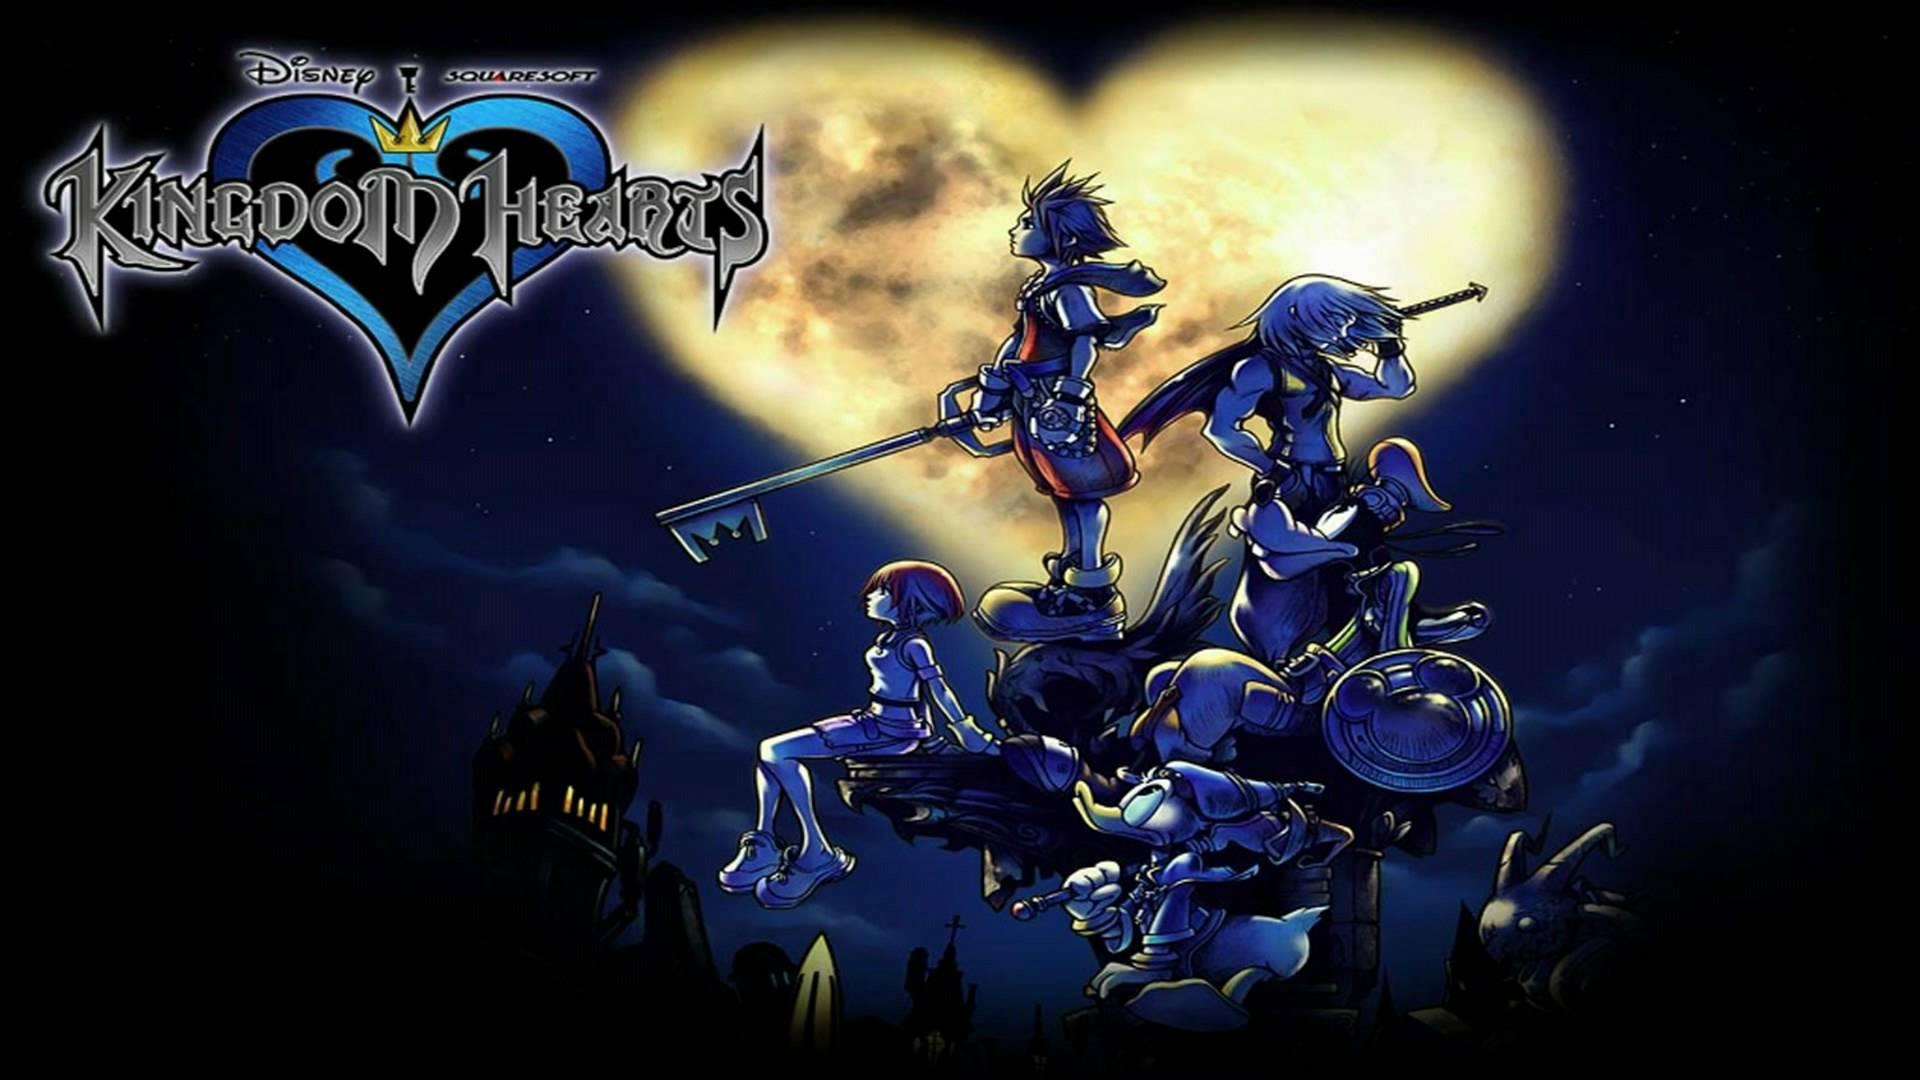 Kingdom Hearts HD 1.5 + 2.5 Remix brings the series ...